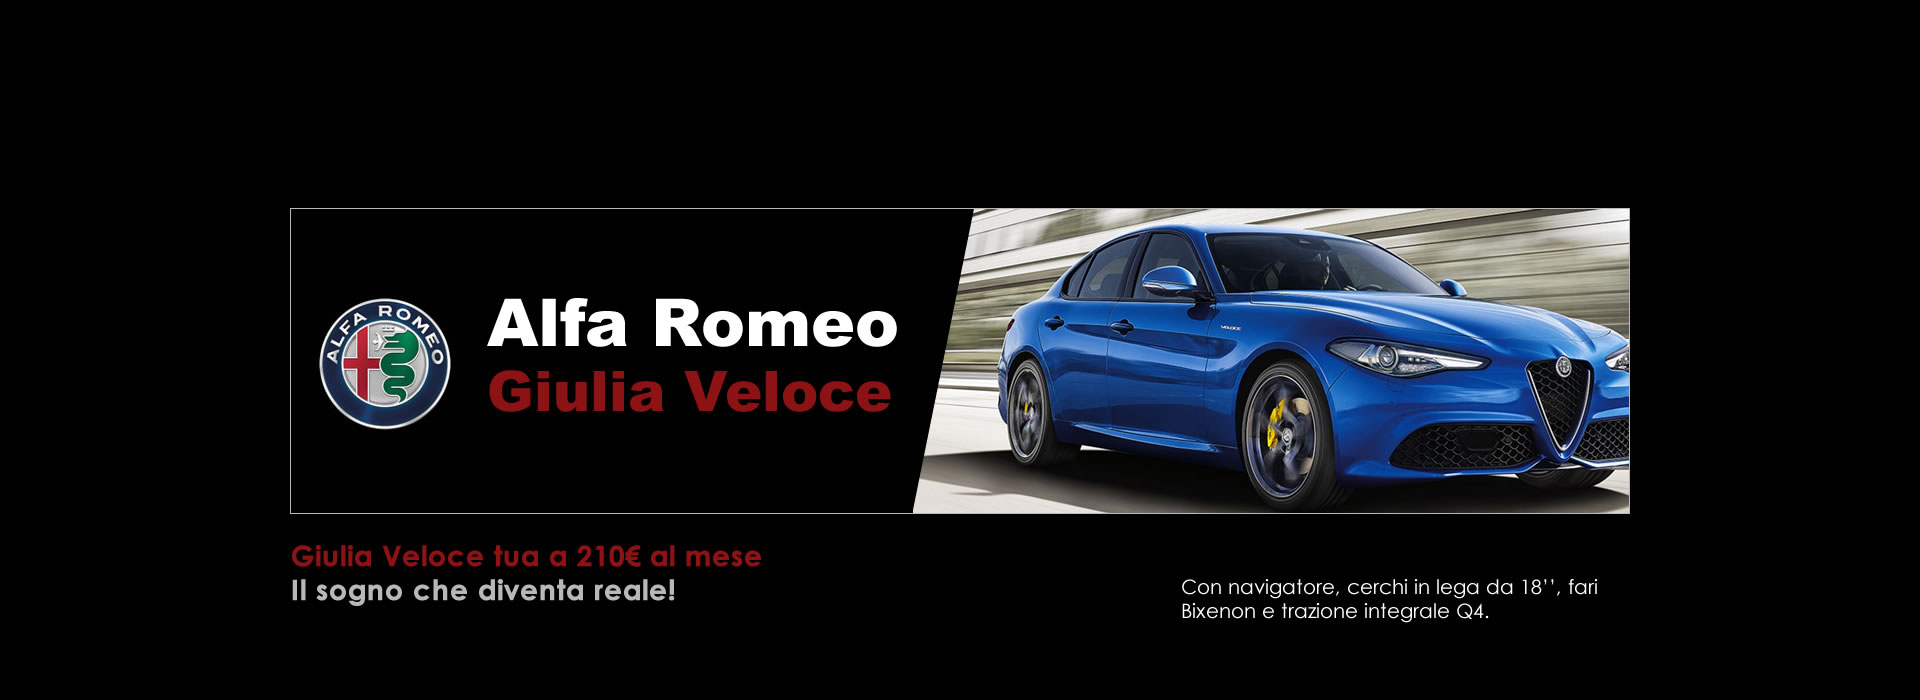 Concessionaria_Tamburini_Auto_Alfa_Romeo